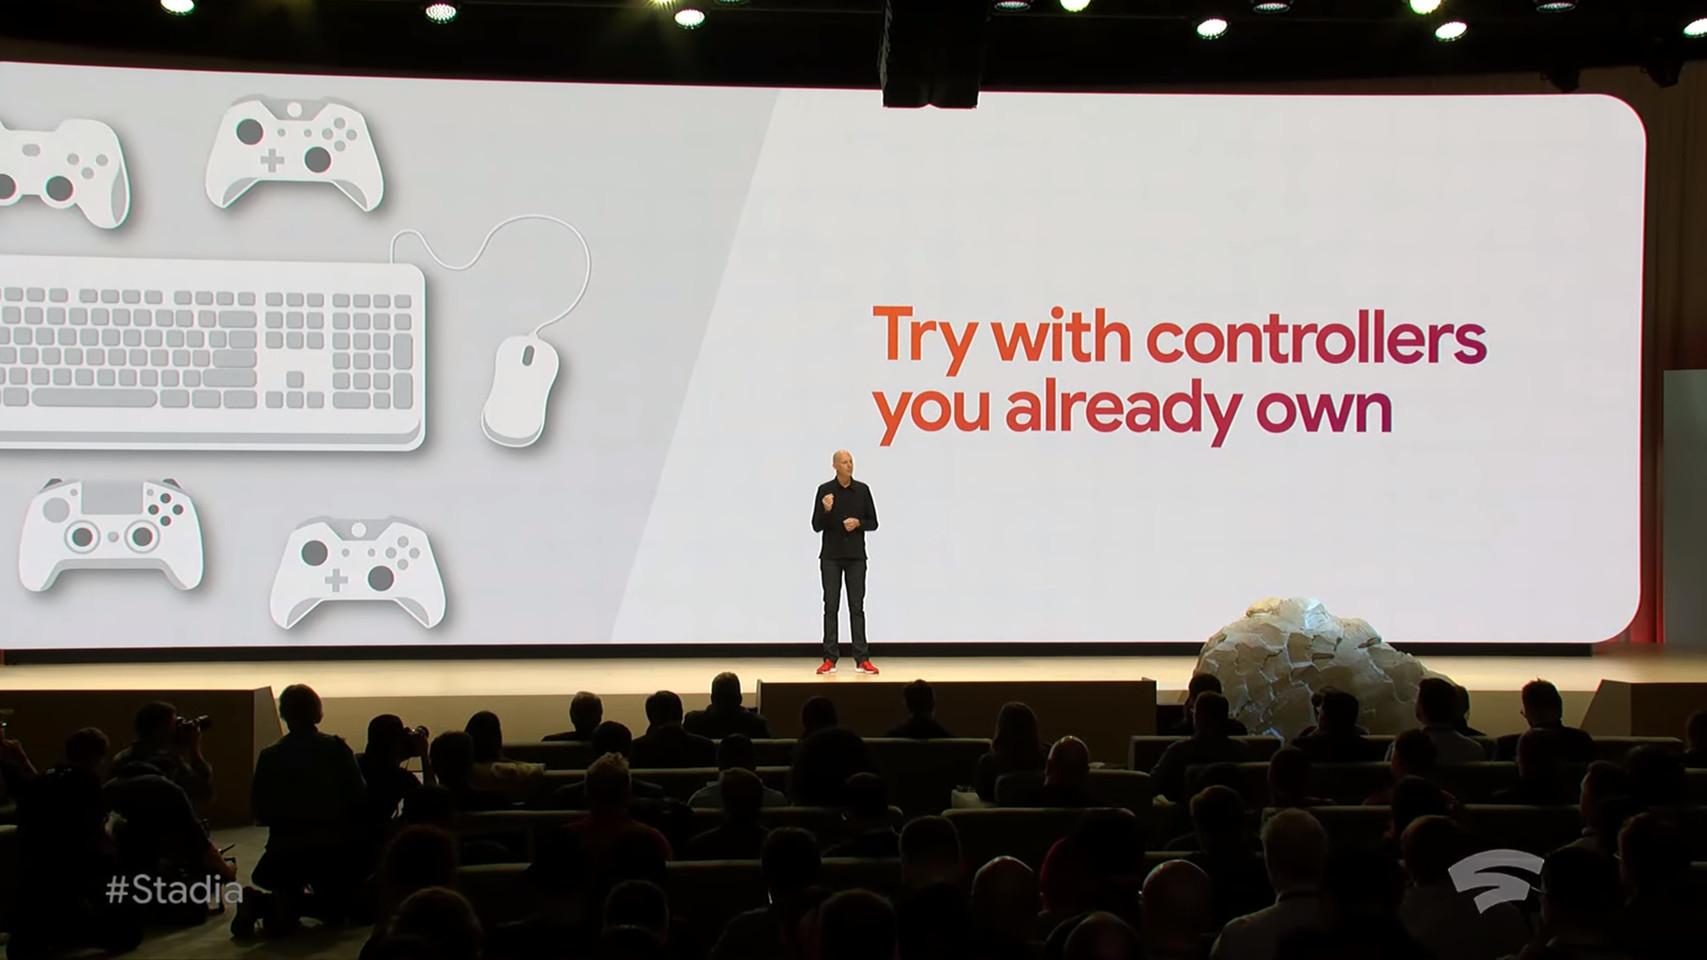 Google Announces Stadia Cloud Gaming Service at GDC 2019